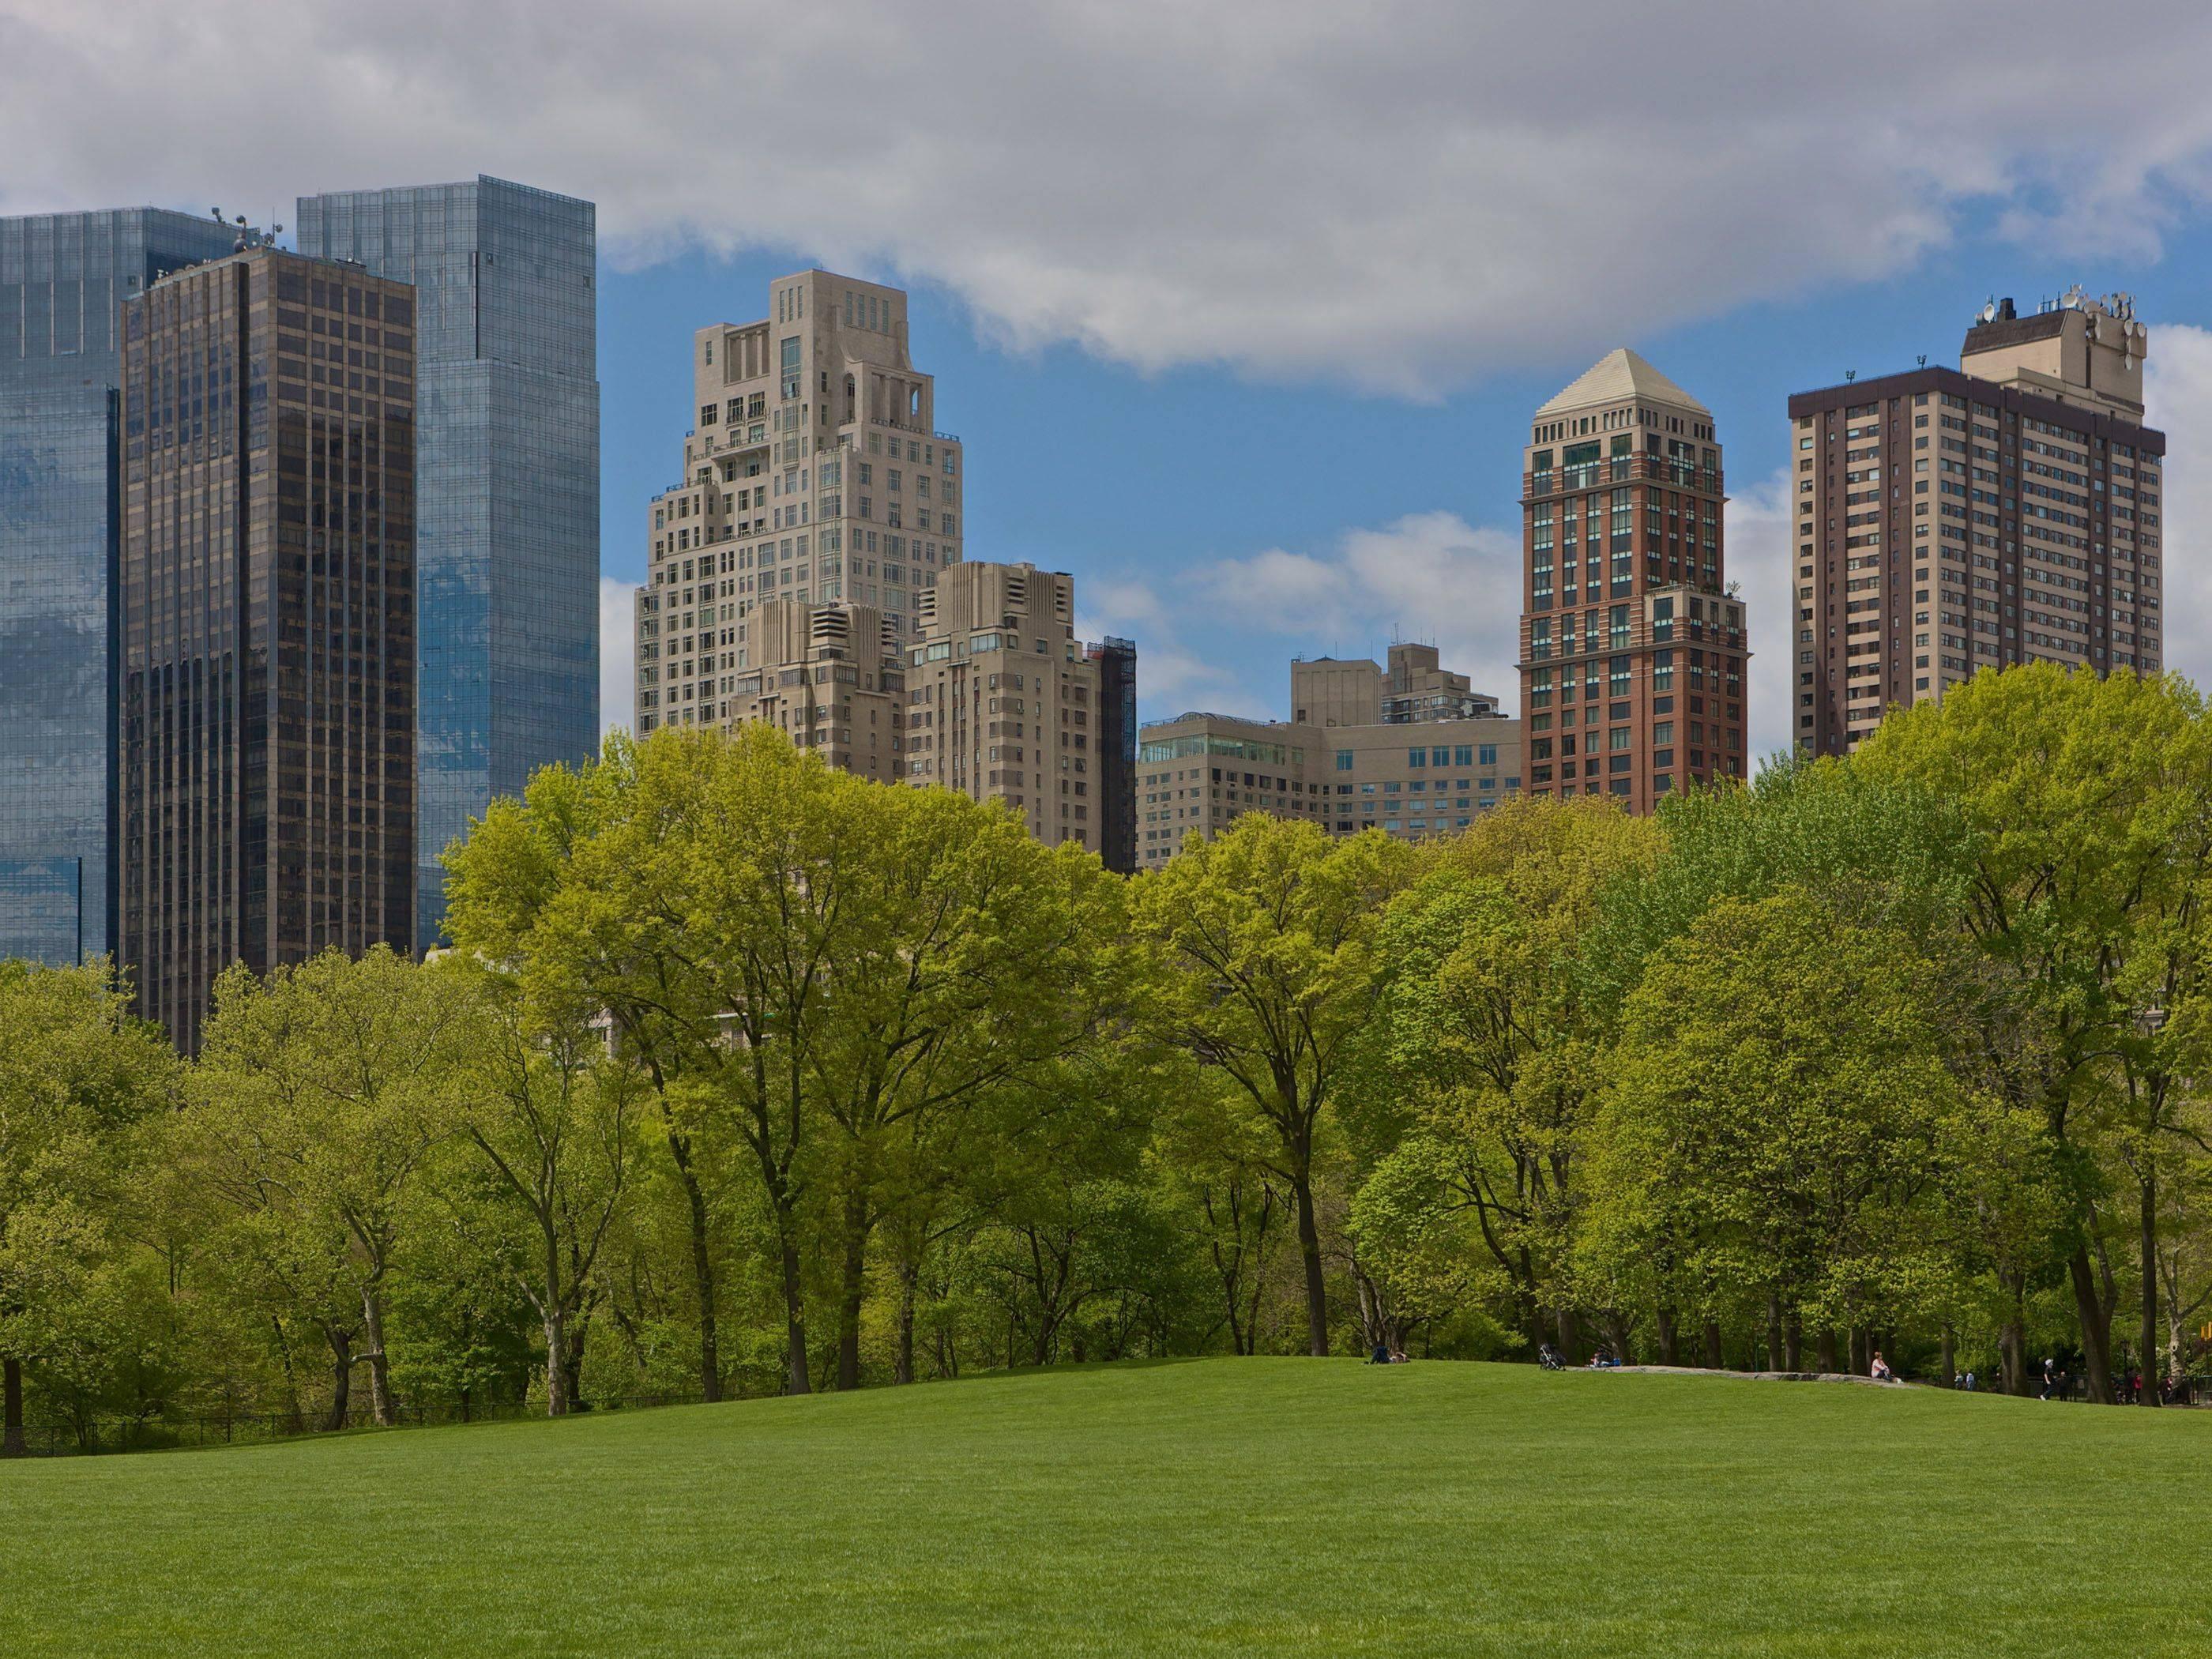 Central Park Backgrounds